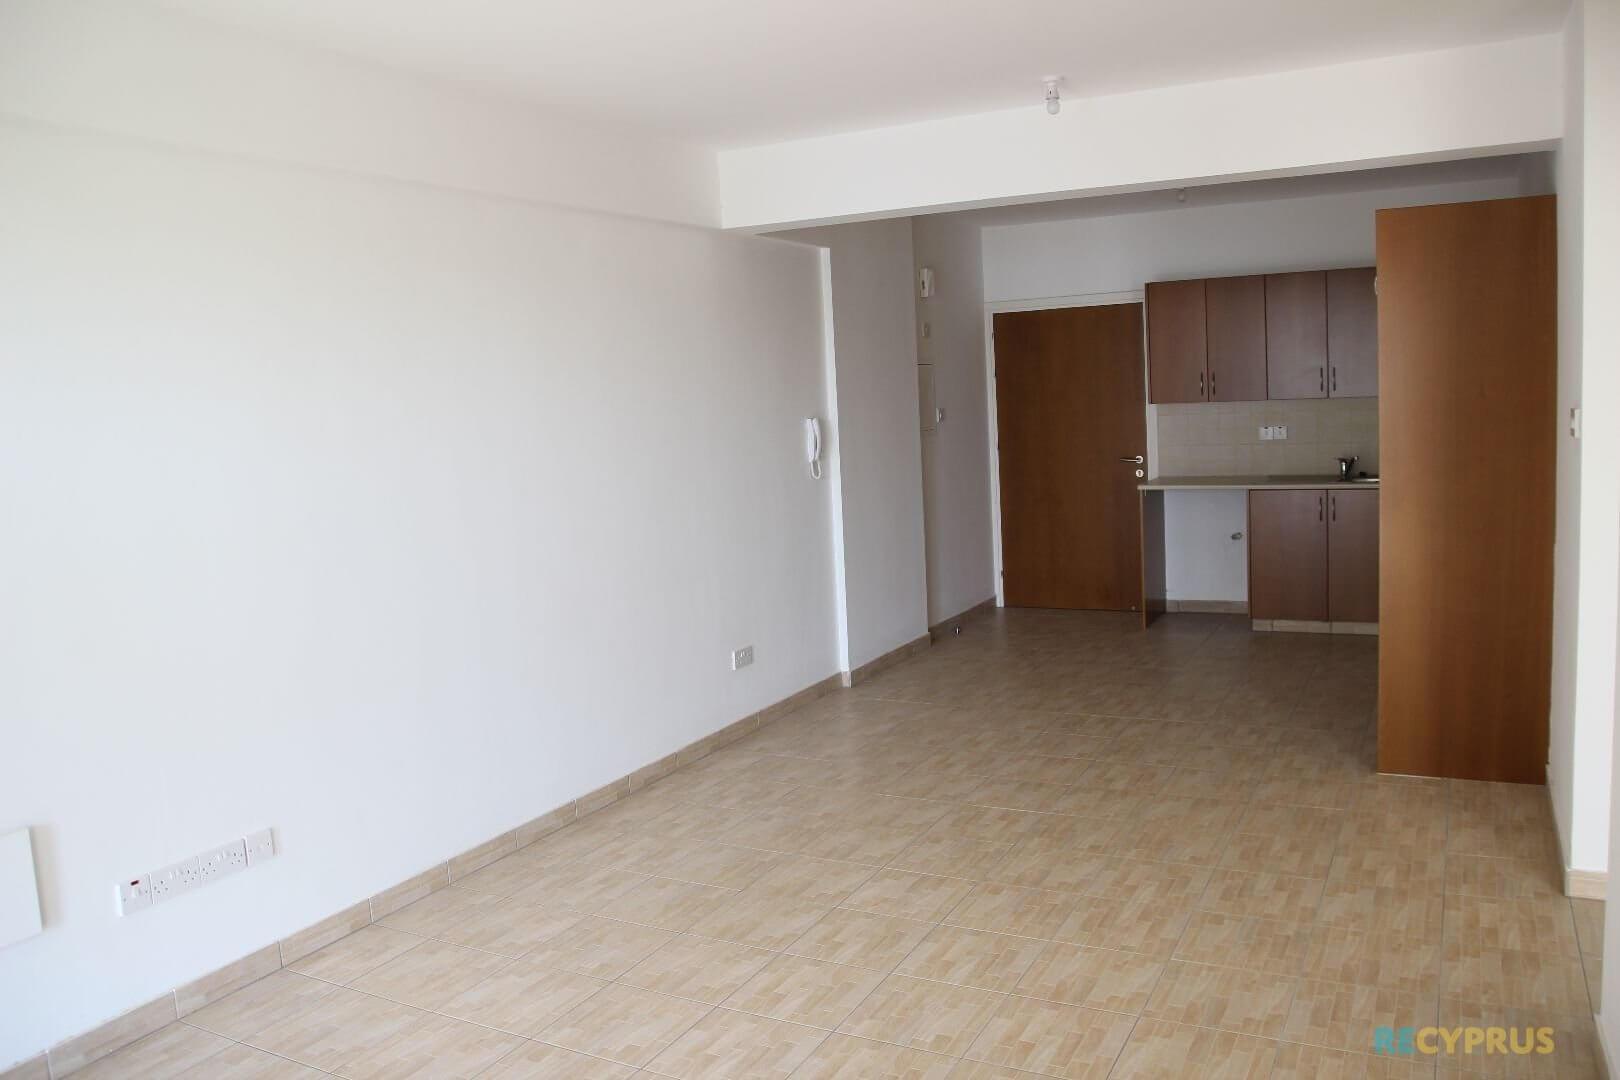 Apartment for sale Kapparis Famagusta Cyprus 2 3519